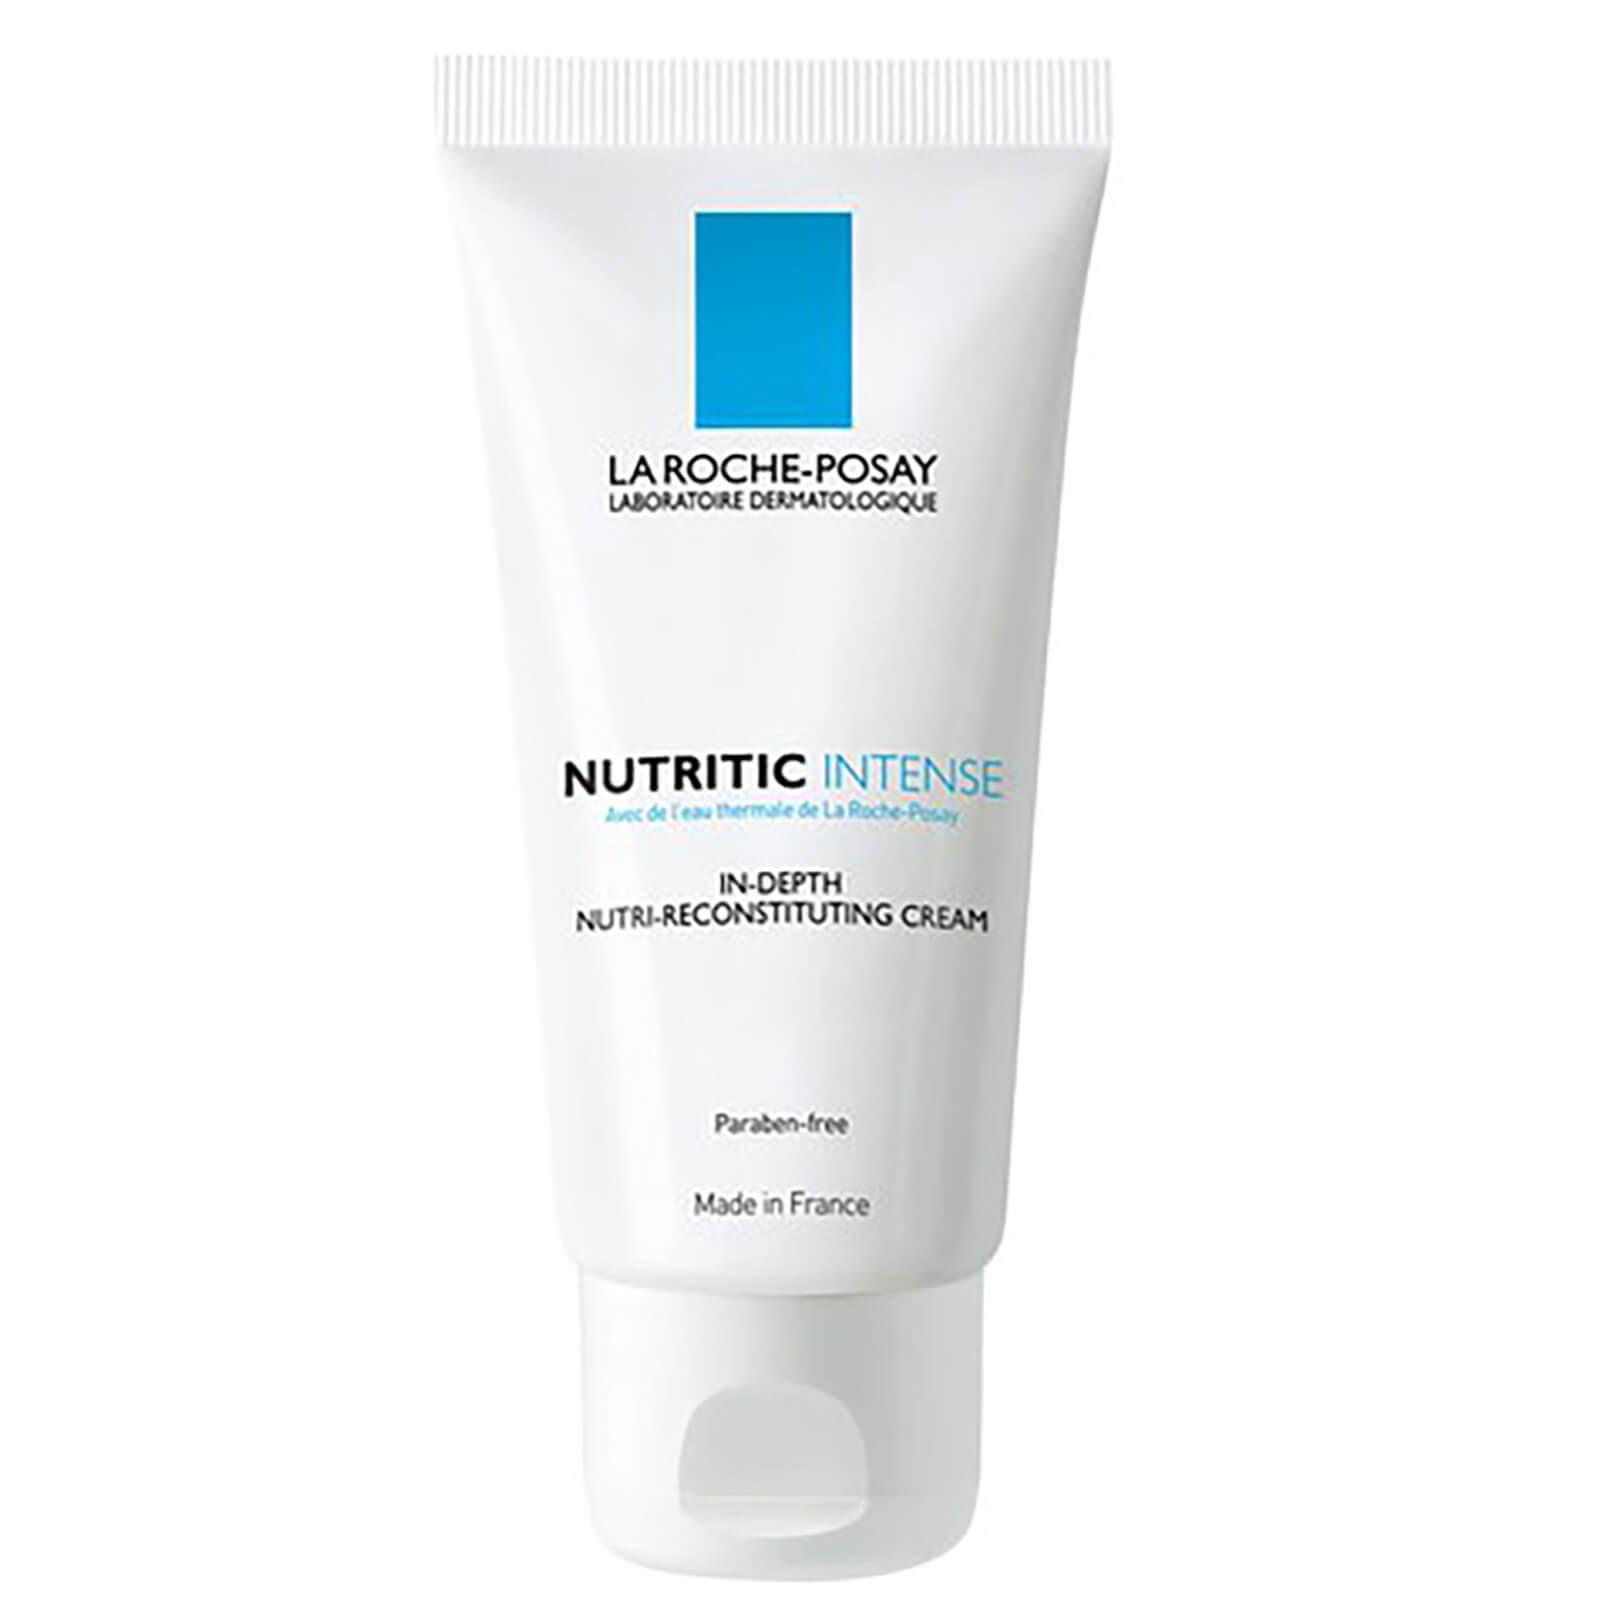 La Roche-Posay Nutritic Intense for Dry Skin 50ml